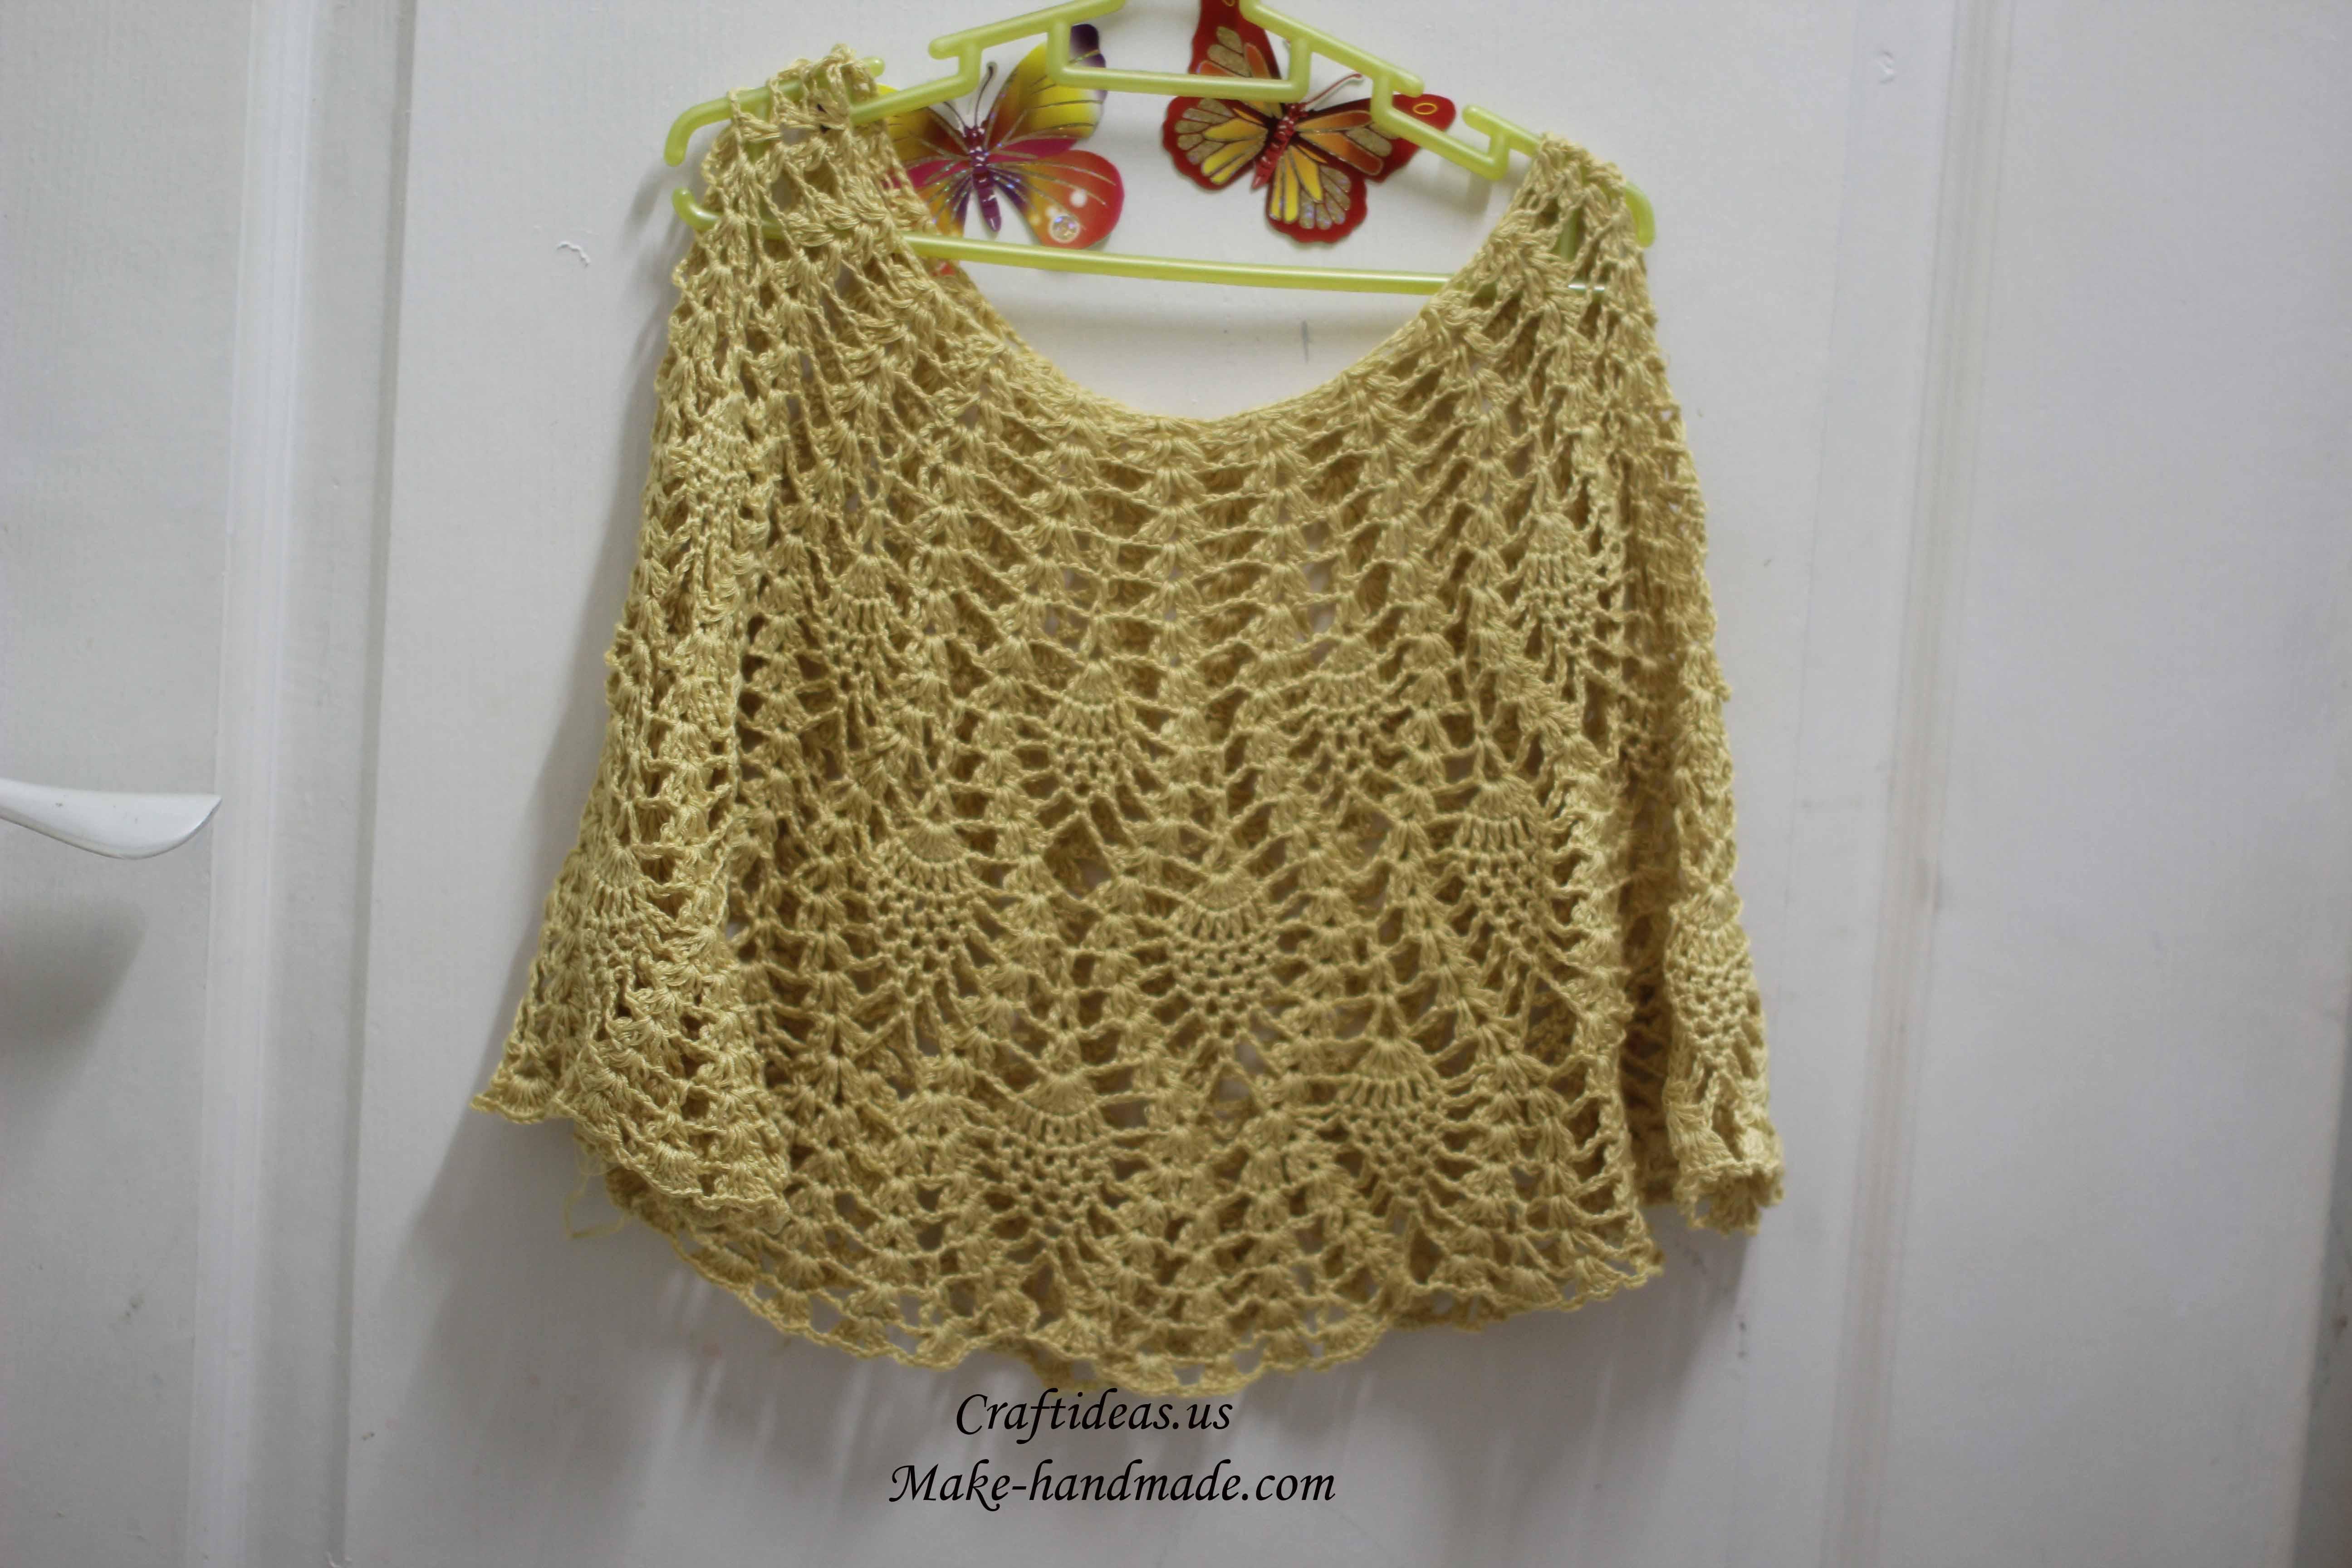 Crocheting Ideas : Crochet beautiful pineapple baby dress - Craft Ideas